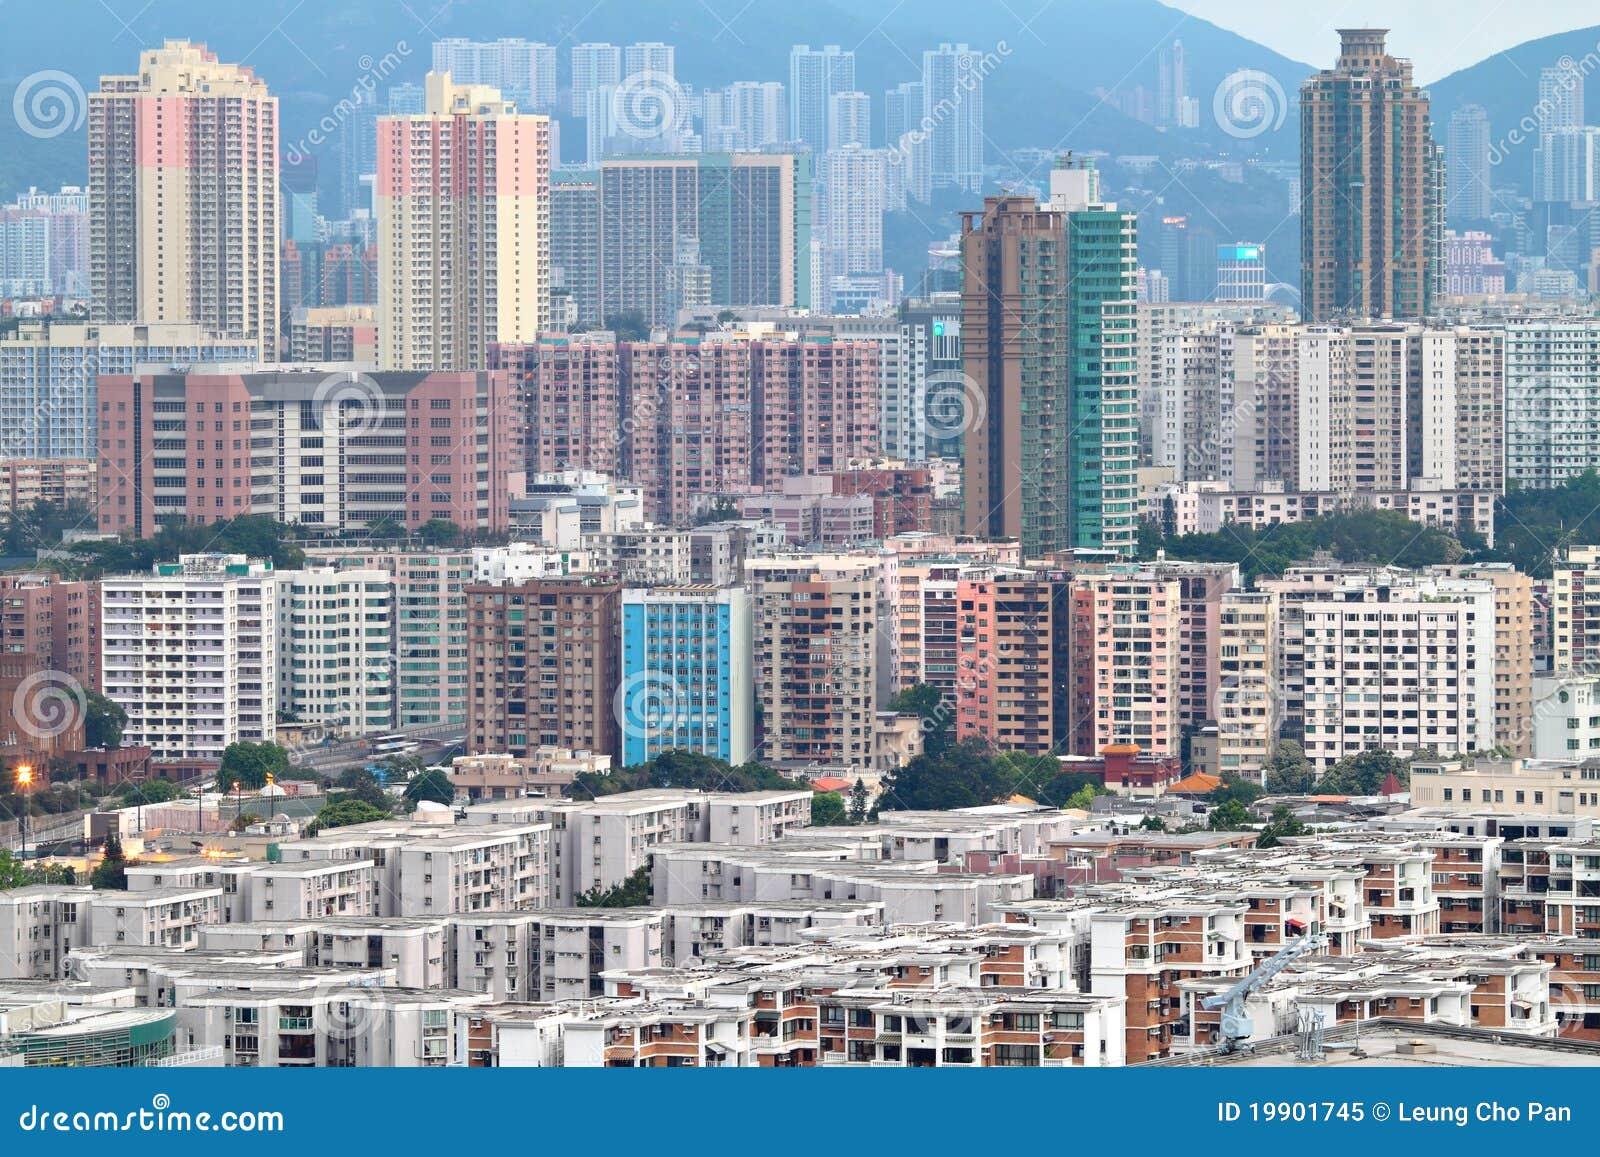 Hong Kong Crowded Buildings Stock Image Image 19901745